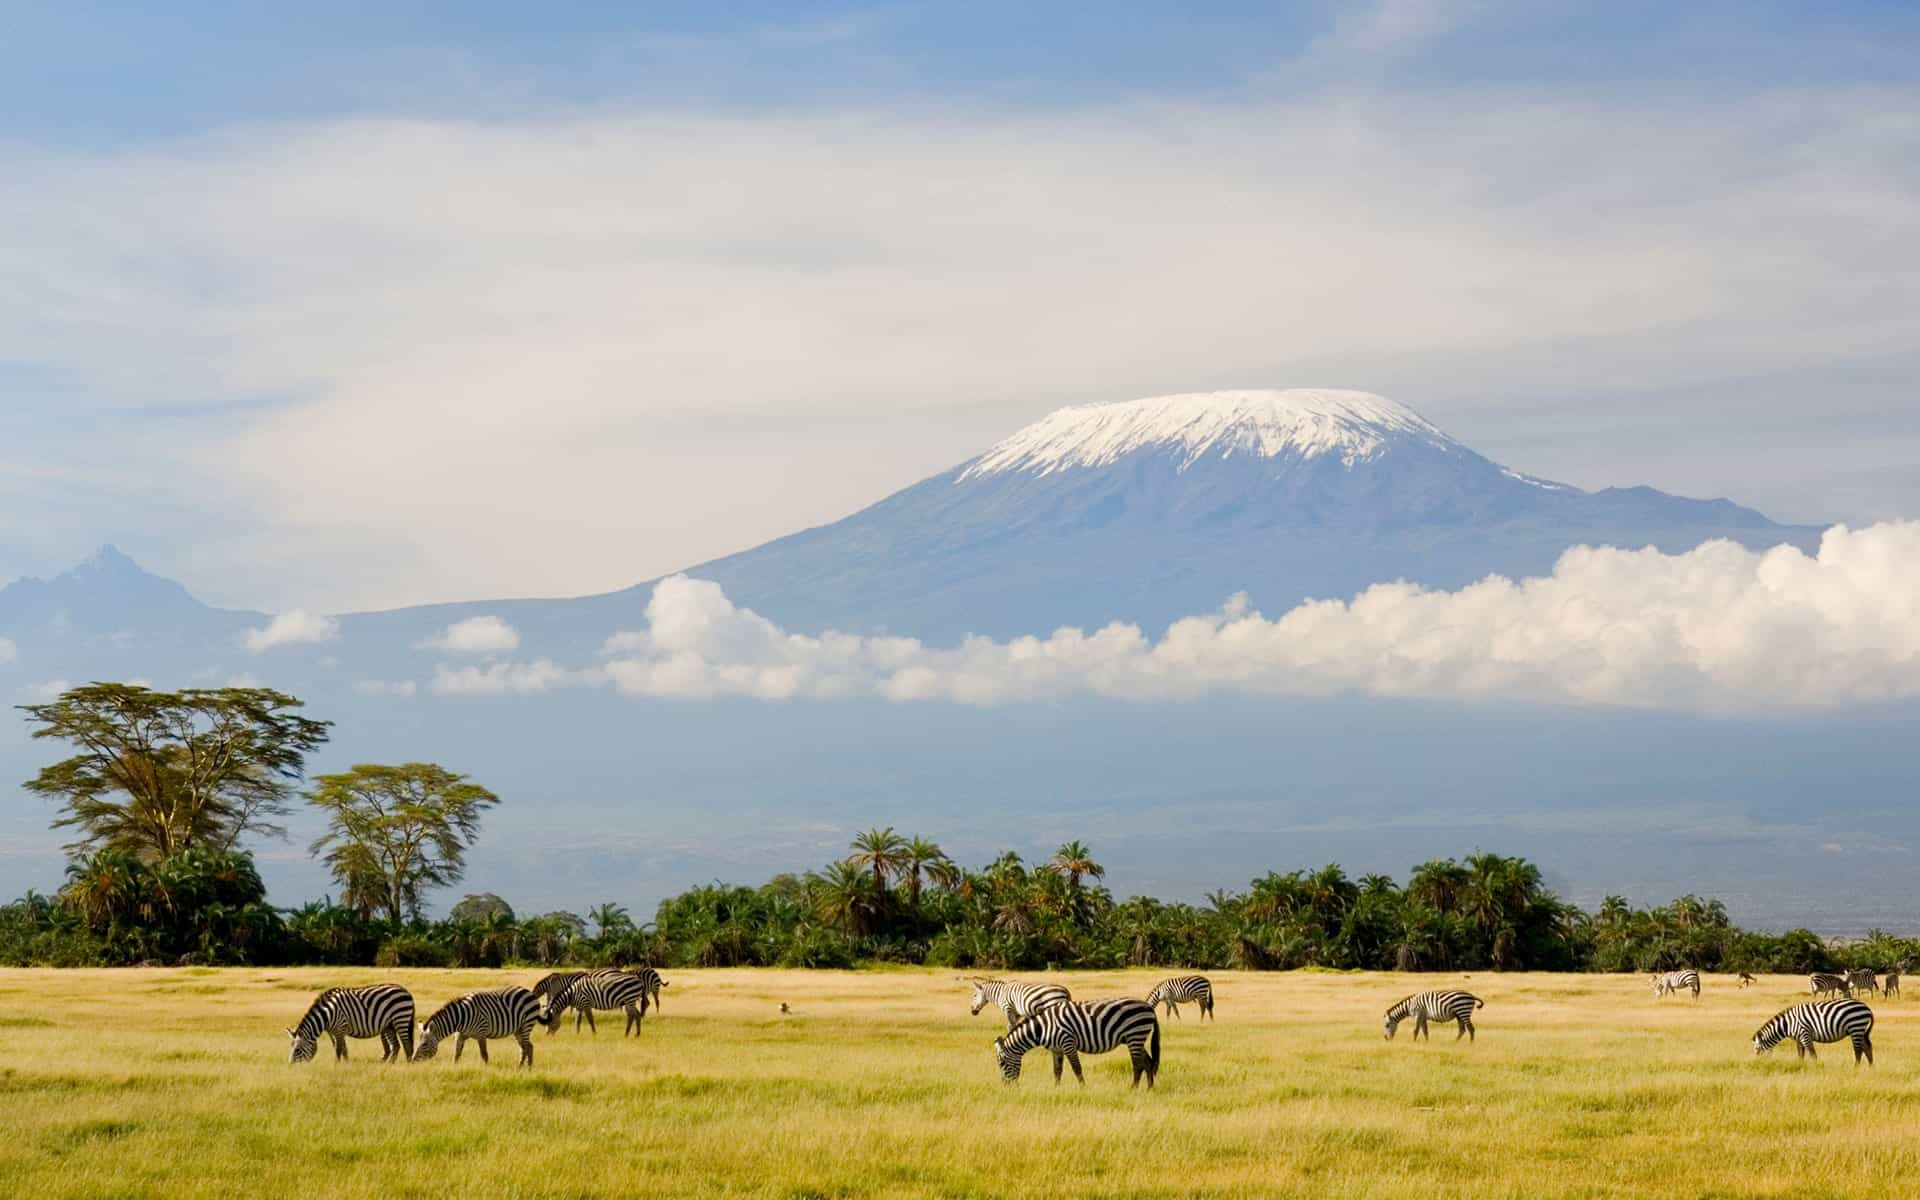 Kilimanjarozebra